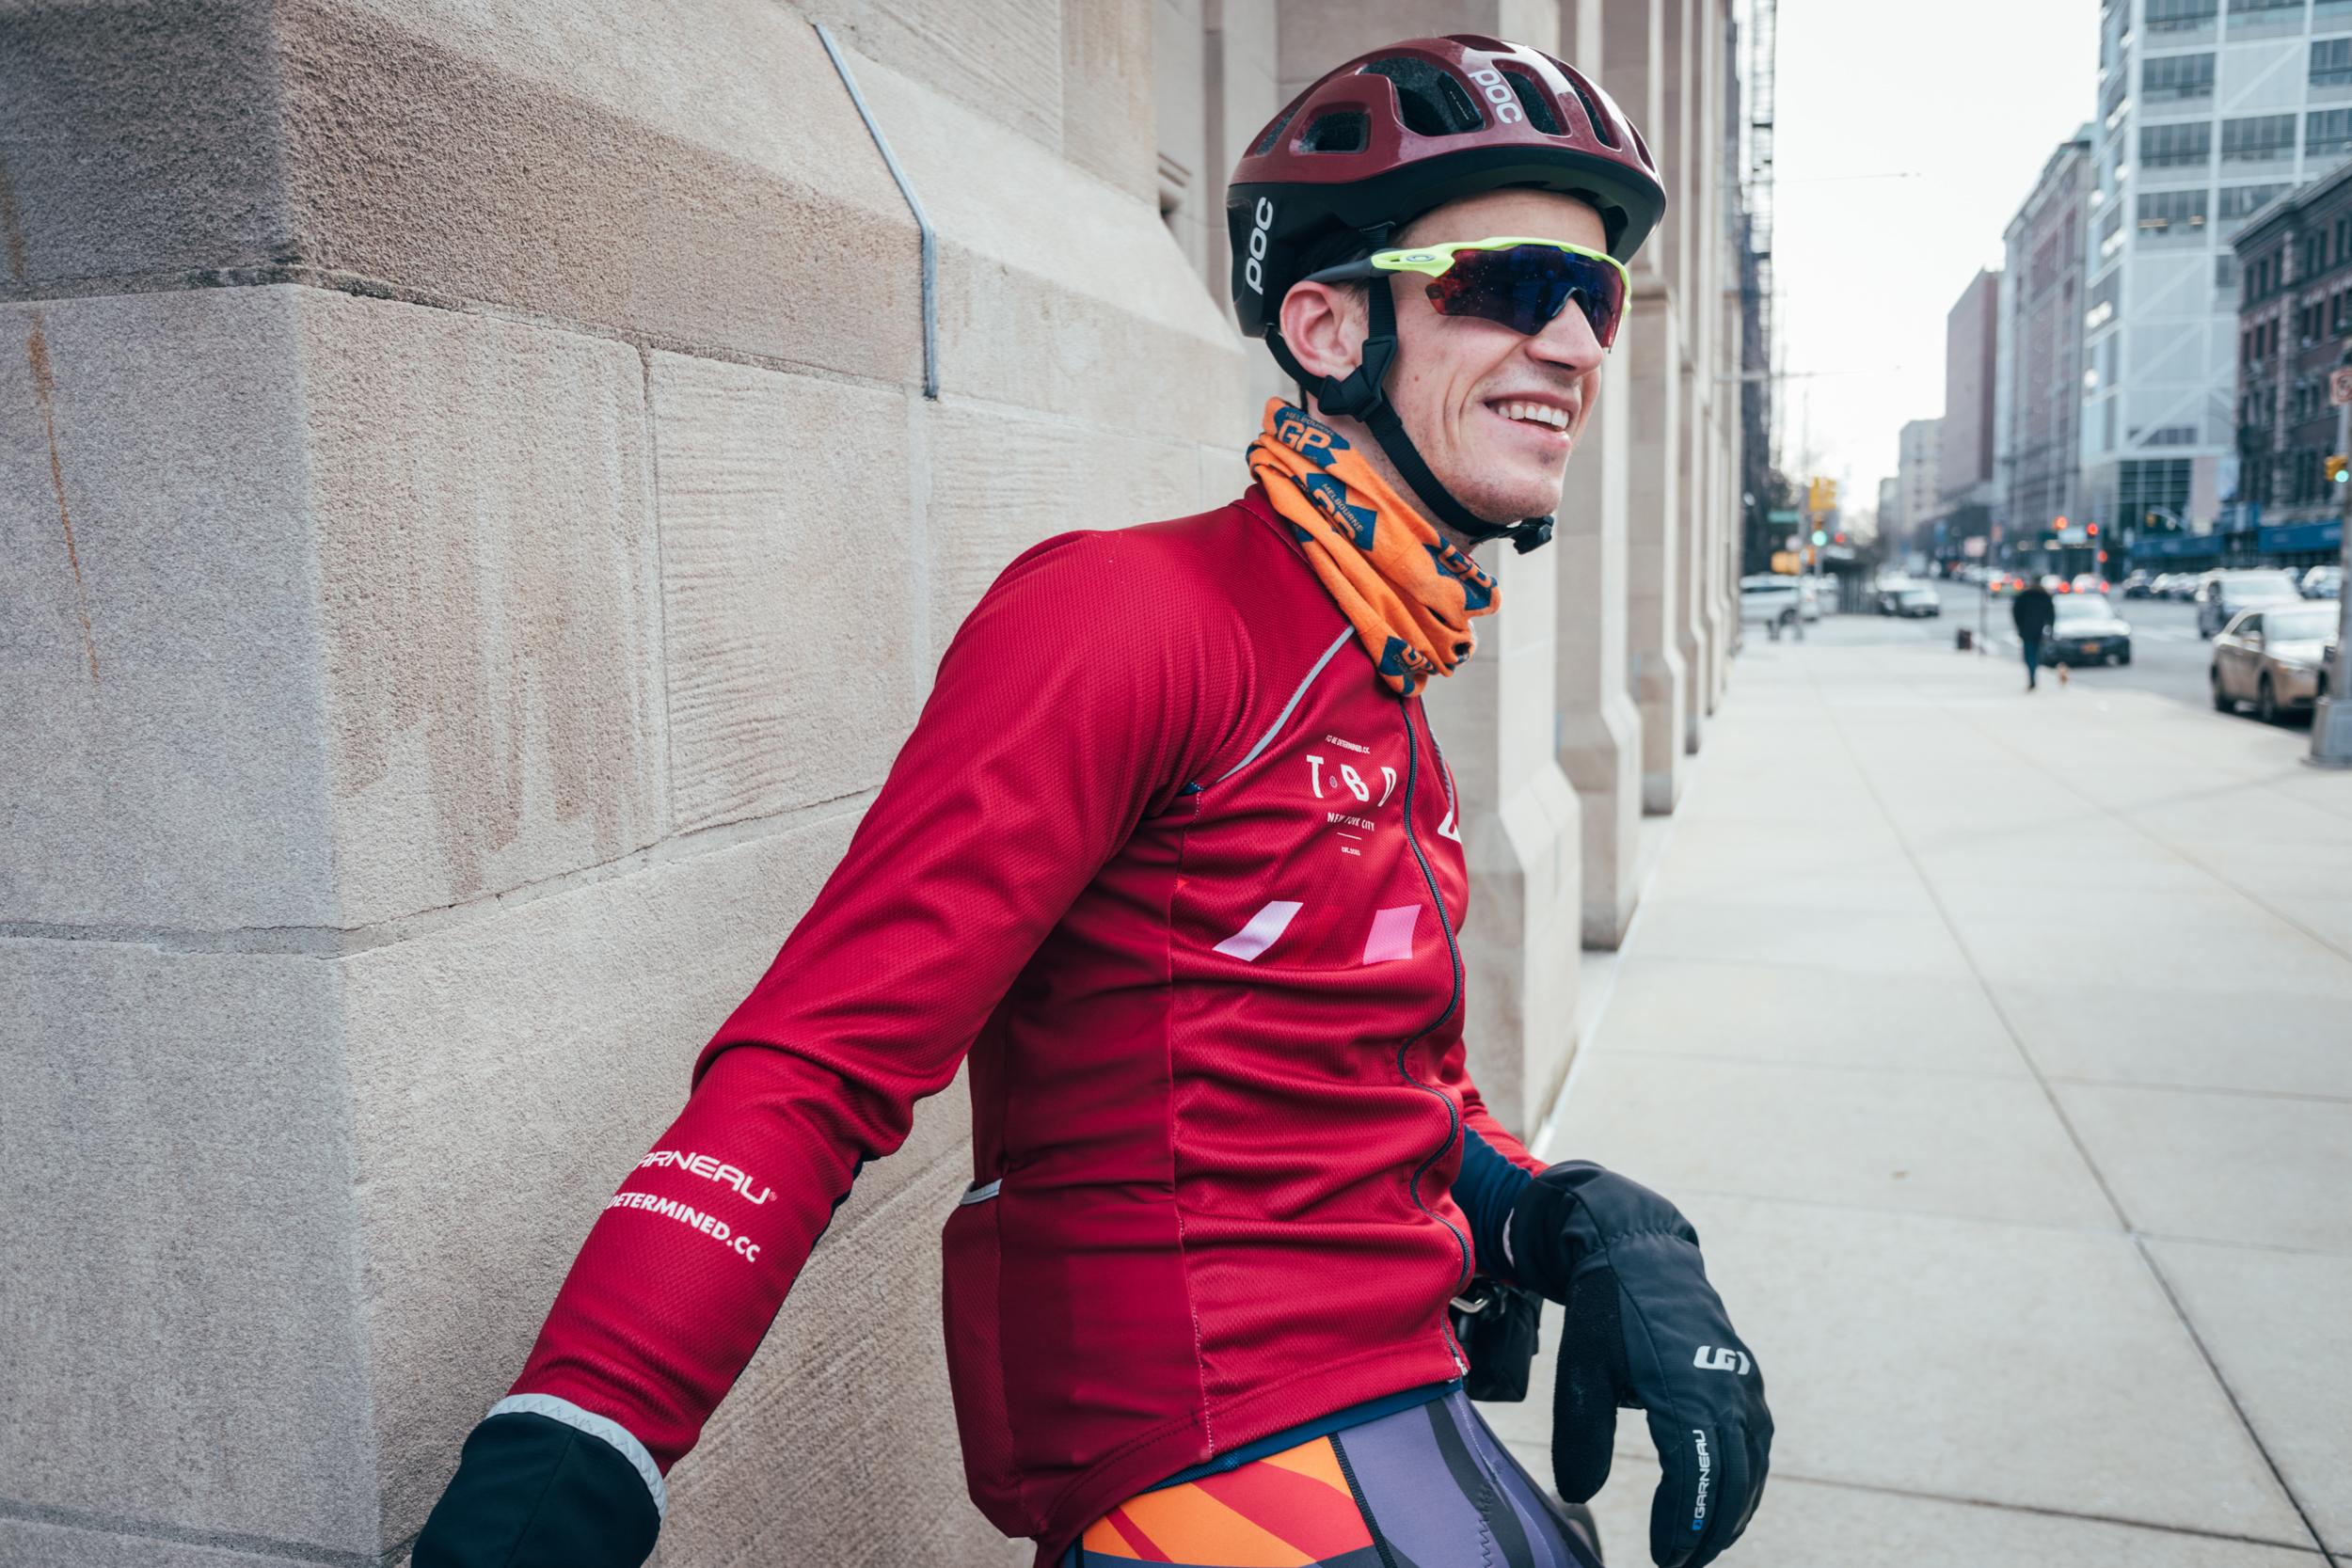 All smiles pre-ride! Photo: @photorhetoric